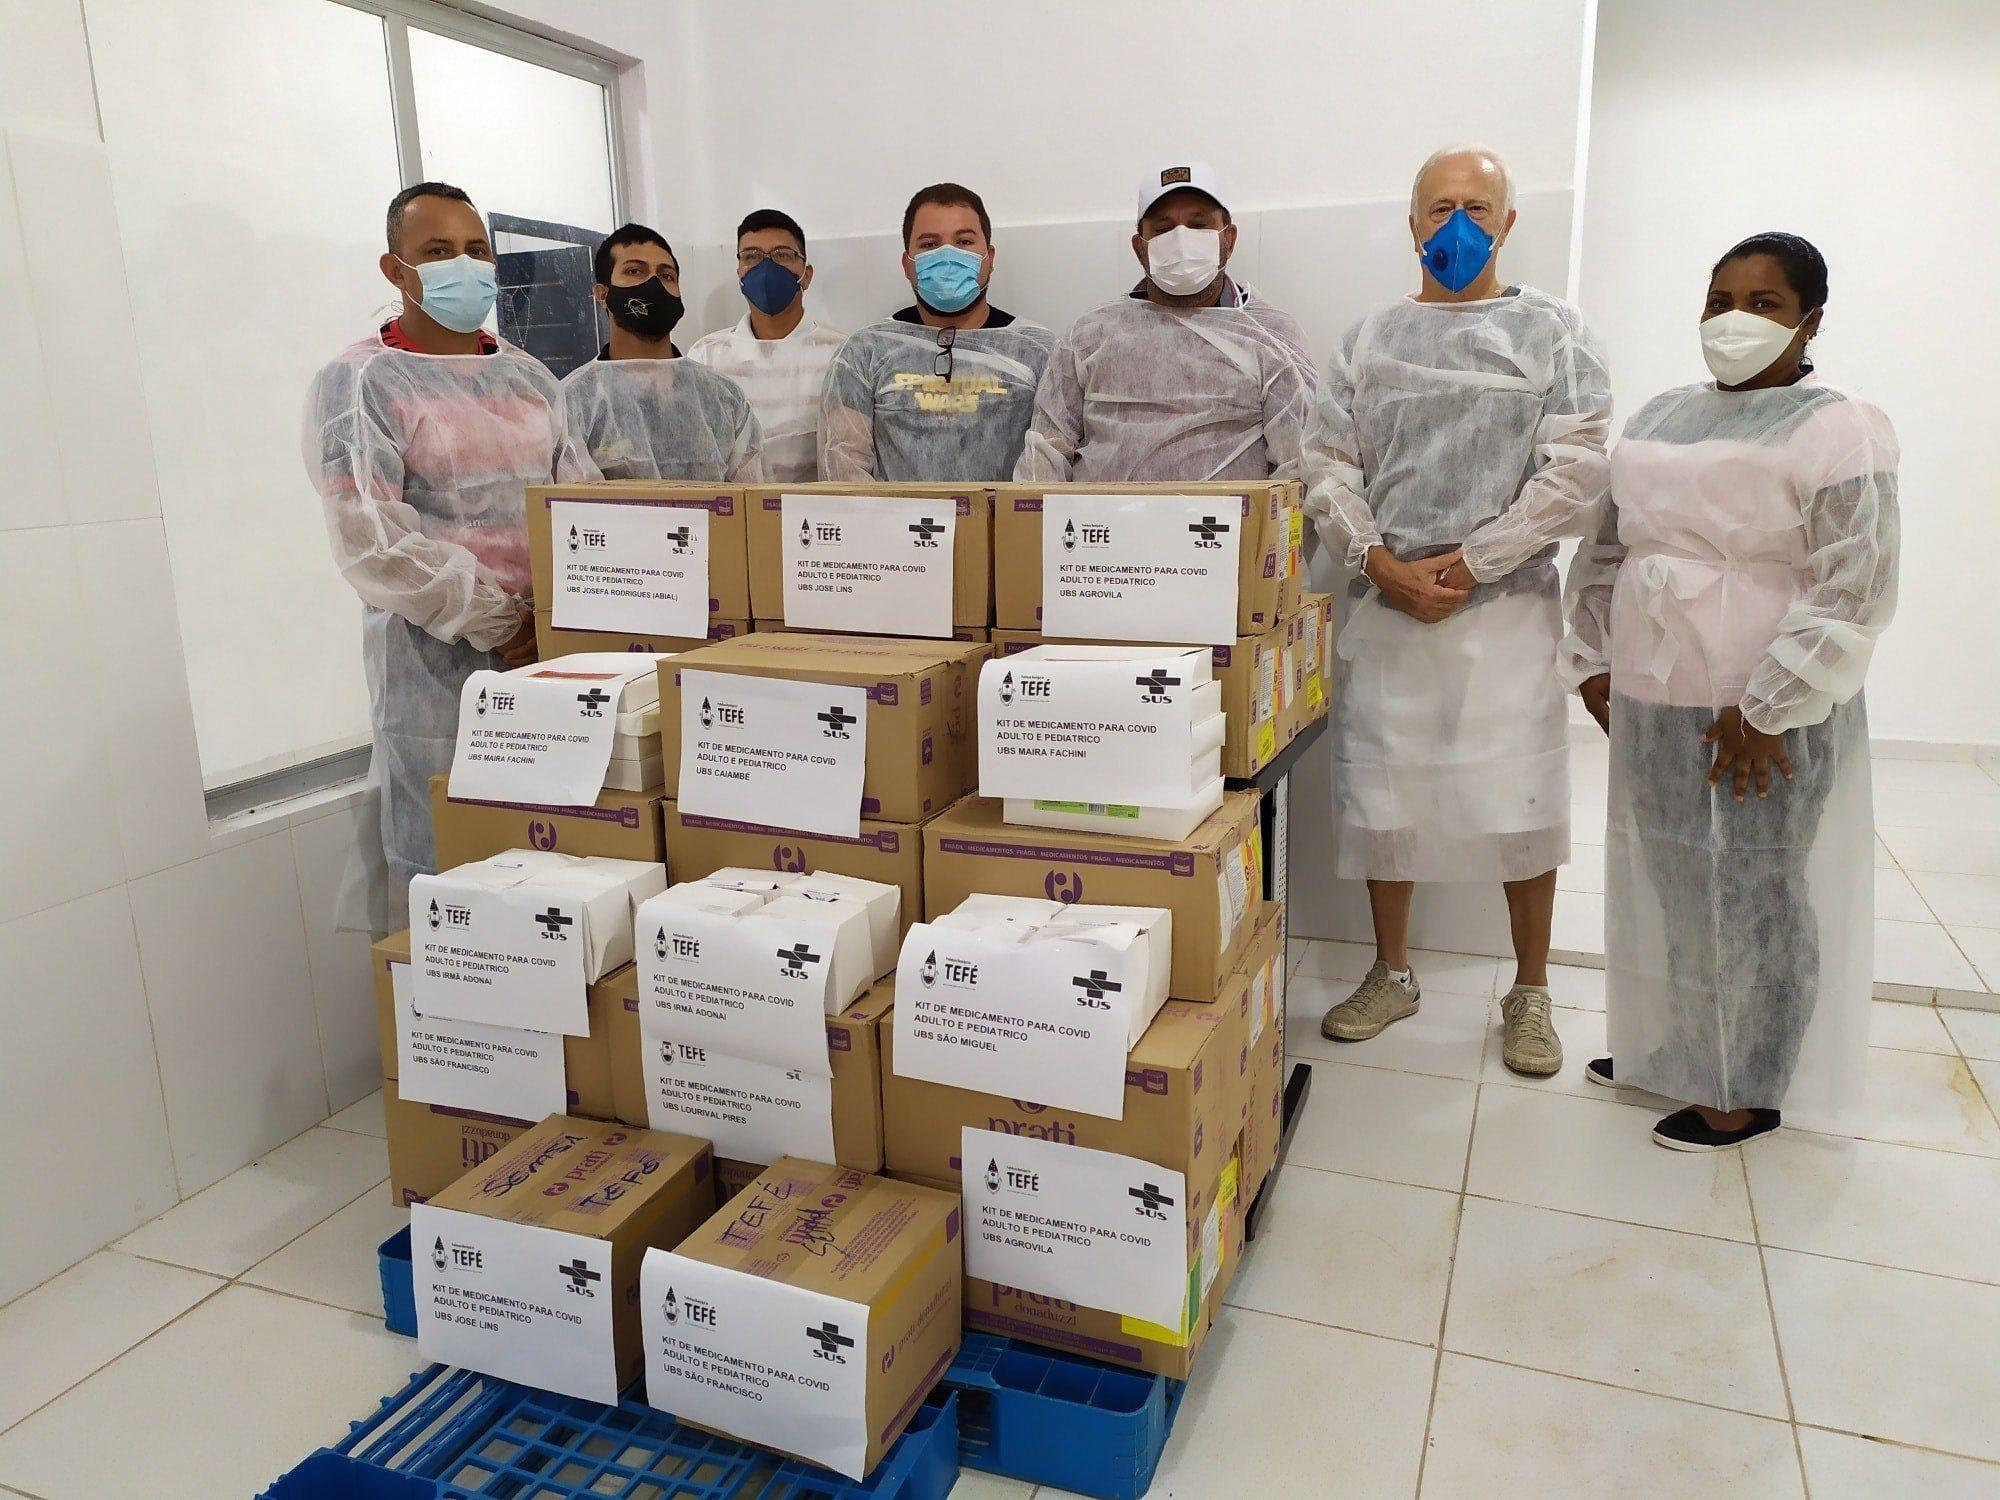 Prefeitura de Tefé vai distribuir kits de medicamentos para Covid-19